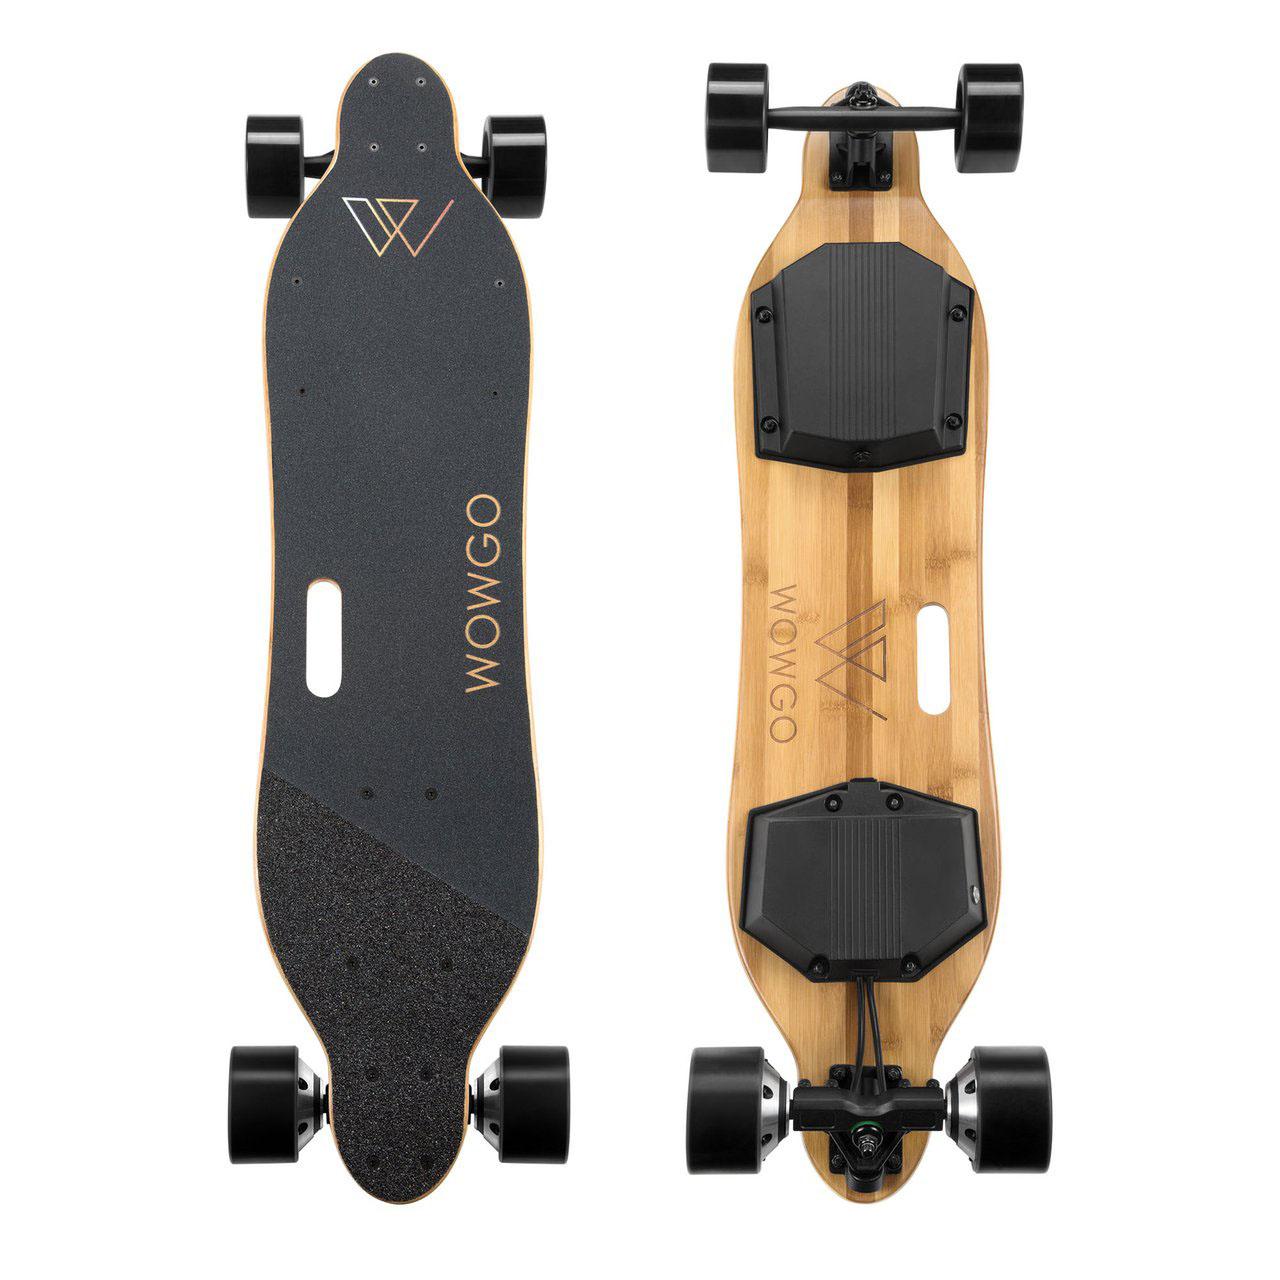 WowGo S2 Electric Longboard